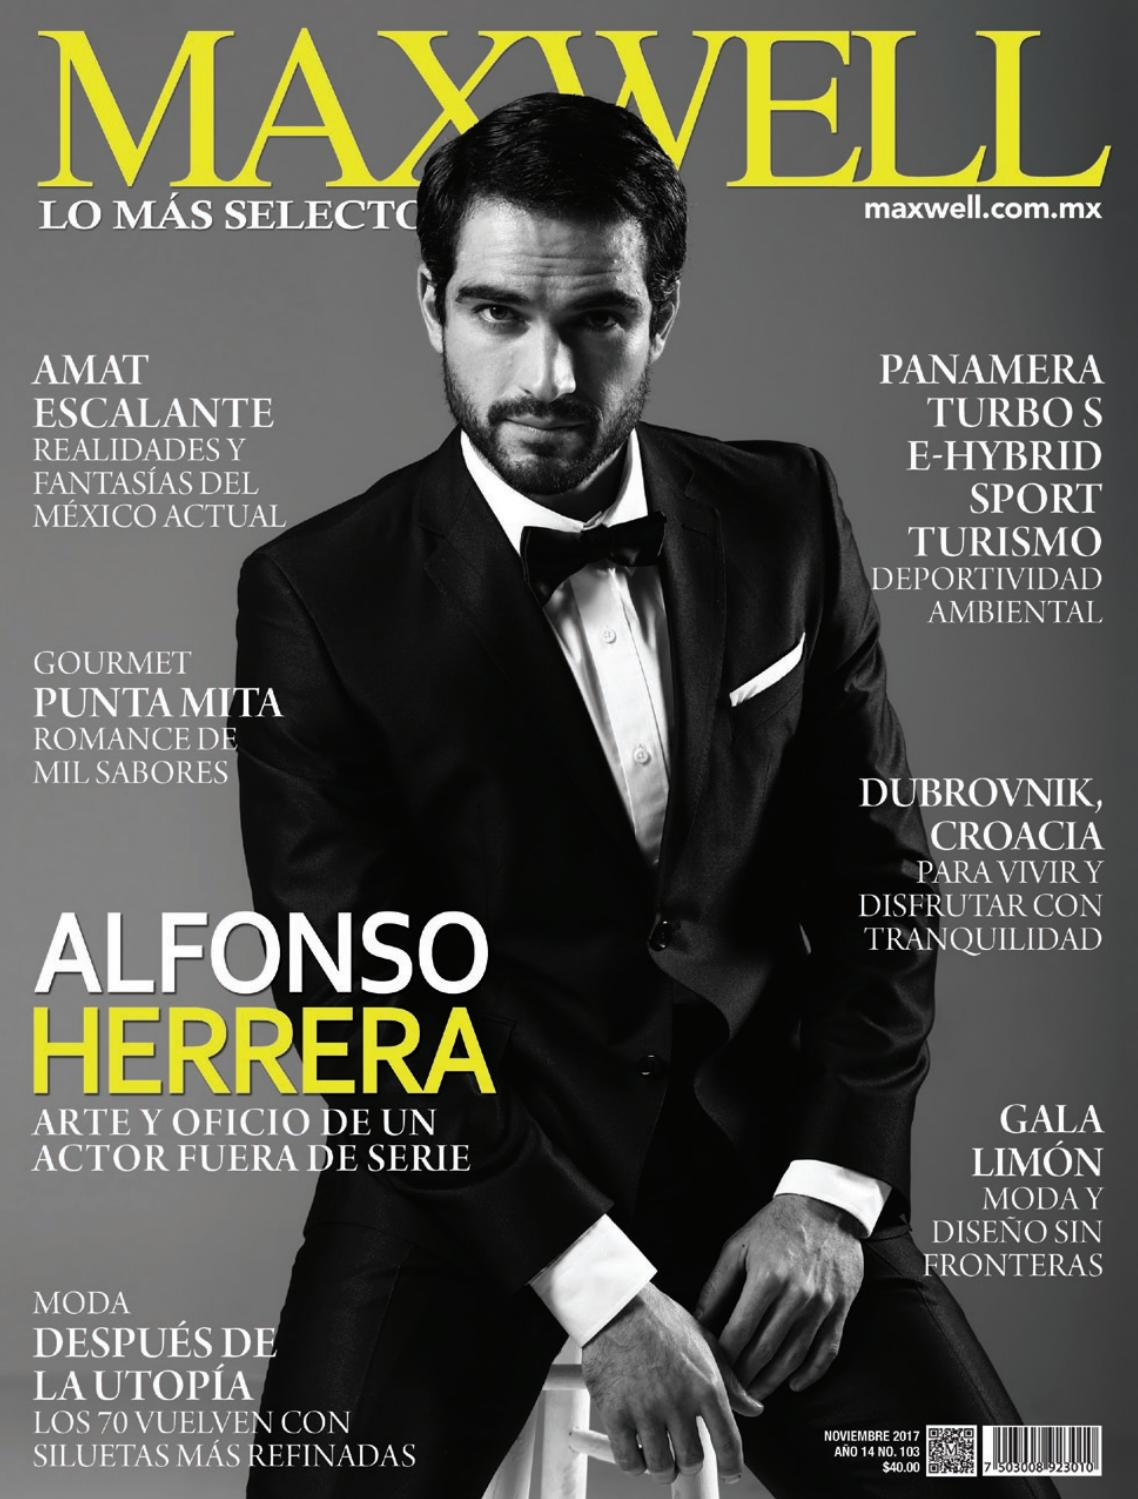 Revista Maxwell Guadalajara Ed 48 By Grupo Editorial Maxwell Issuu # Muebles Goitia Tijuana